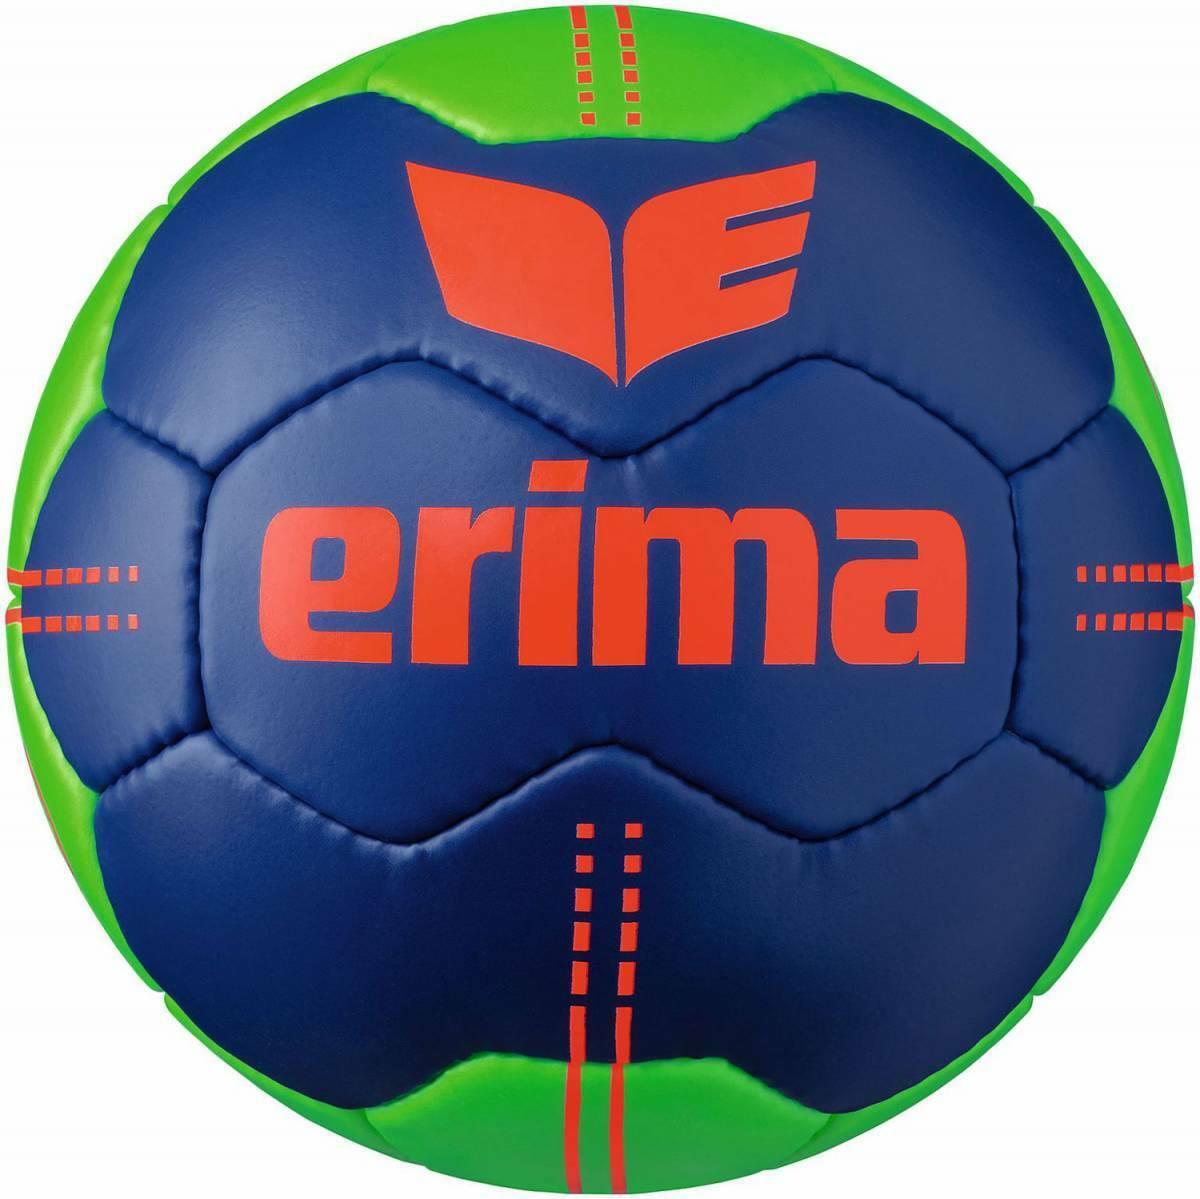 Erima 10er Ballpaket Pure Grip No.3 Handball Handball Handball Training Größe 2 NEU 109823 a06221